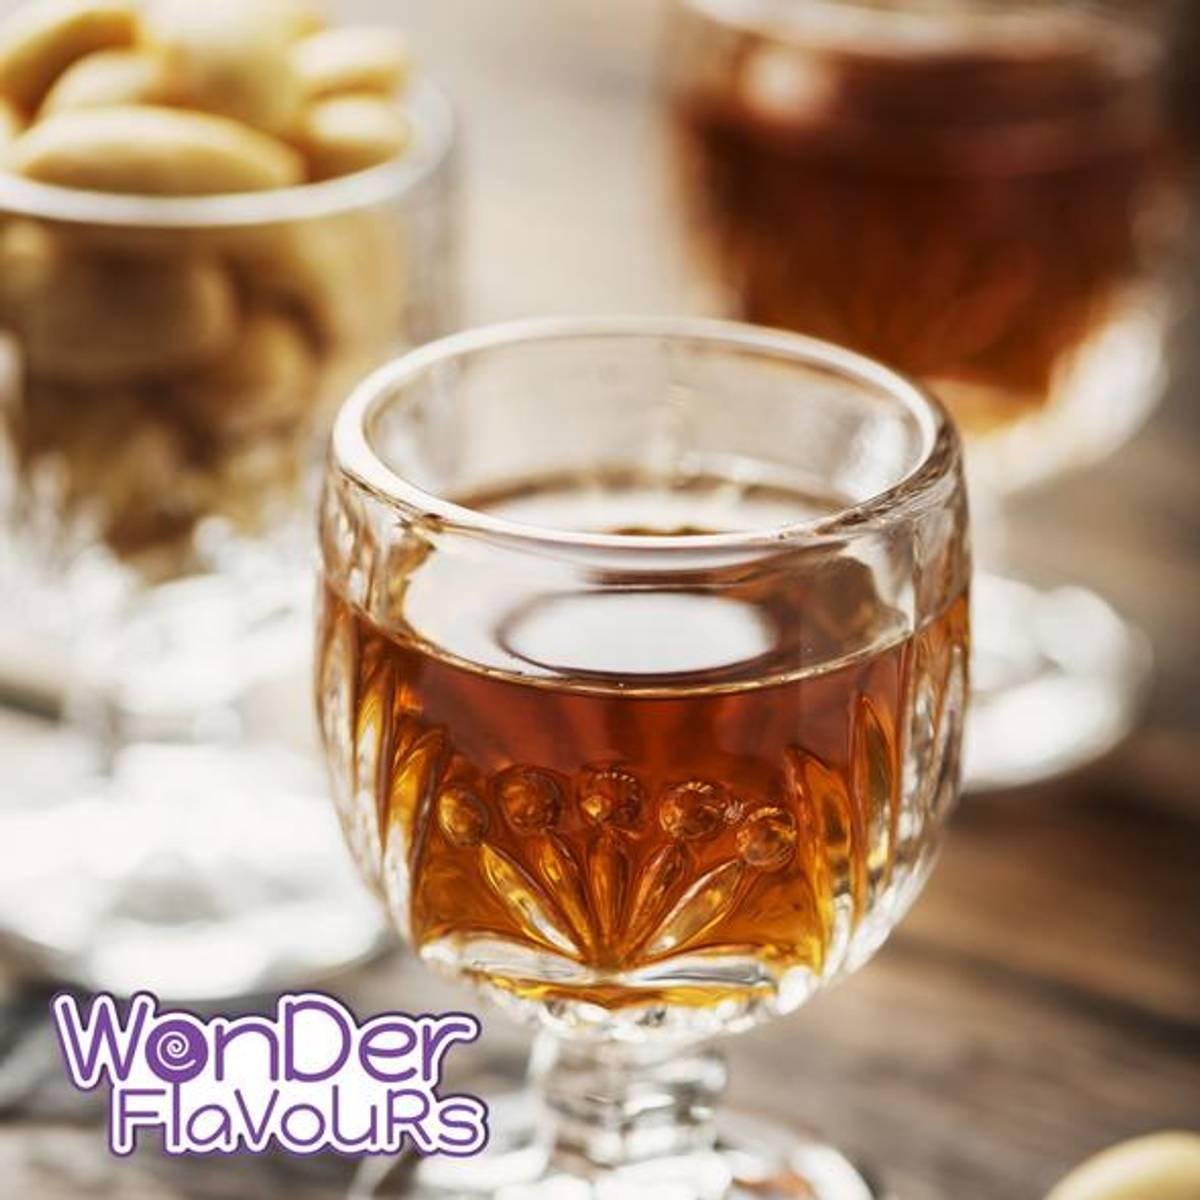 Wonder Flavours (WF) - Tangerine SC, Aroma PGVG.no